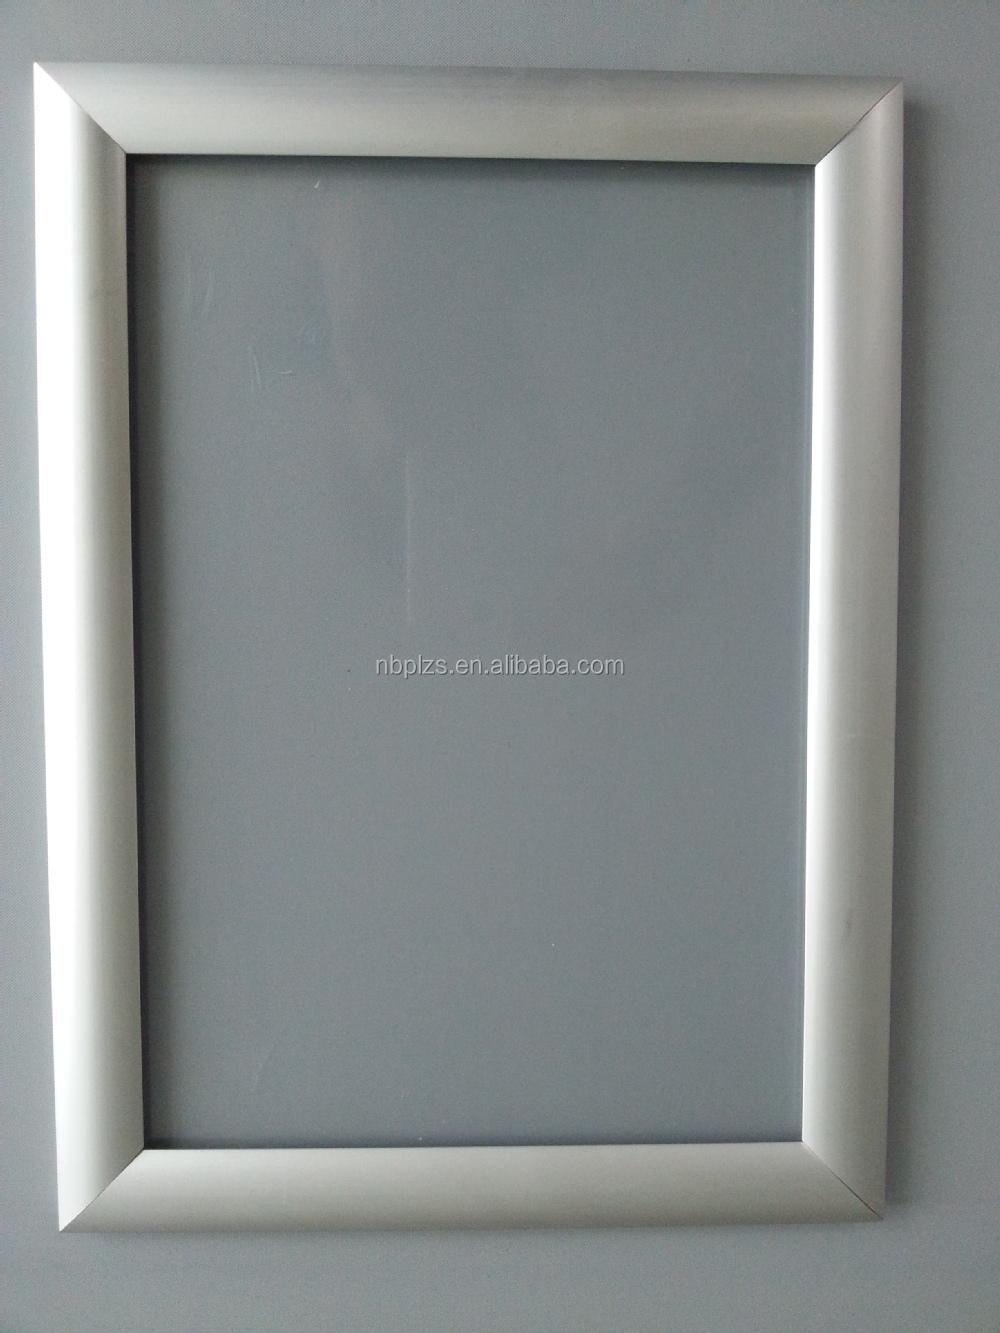 Best Price Advertising Snap Frame,Outdoor Poster Frames Aluminum ...